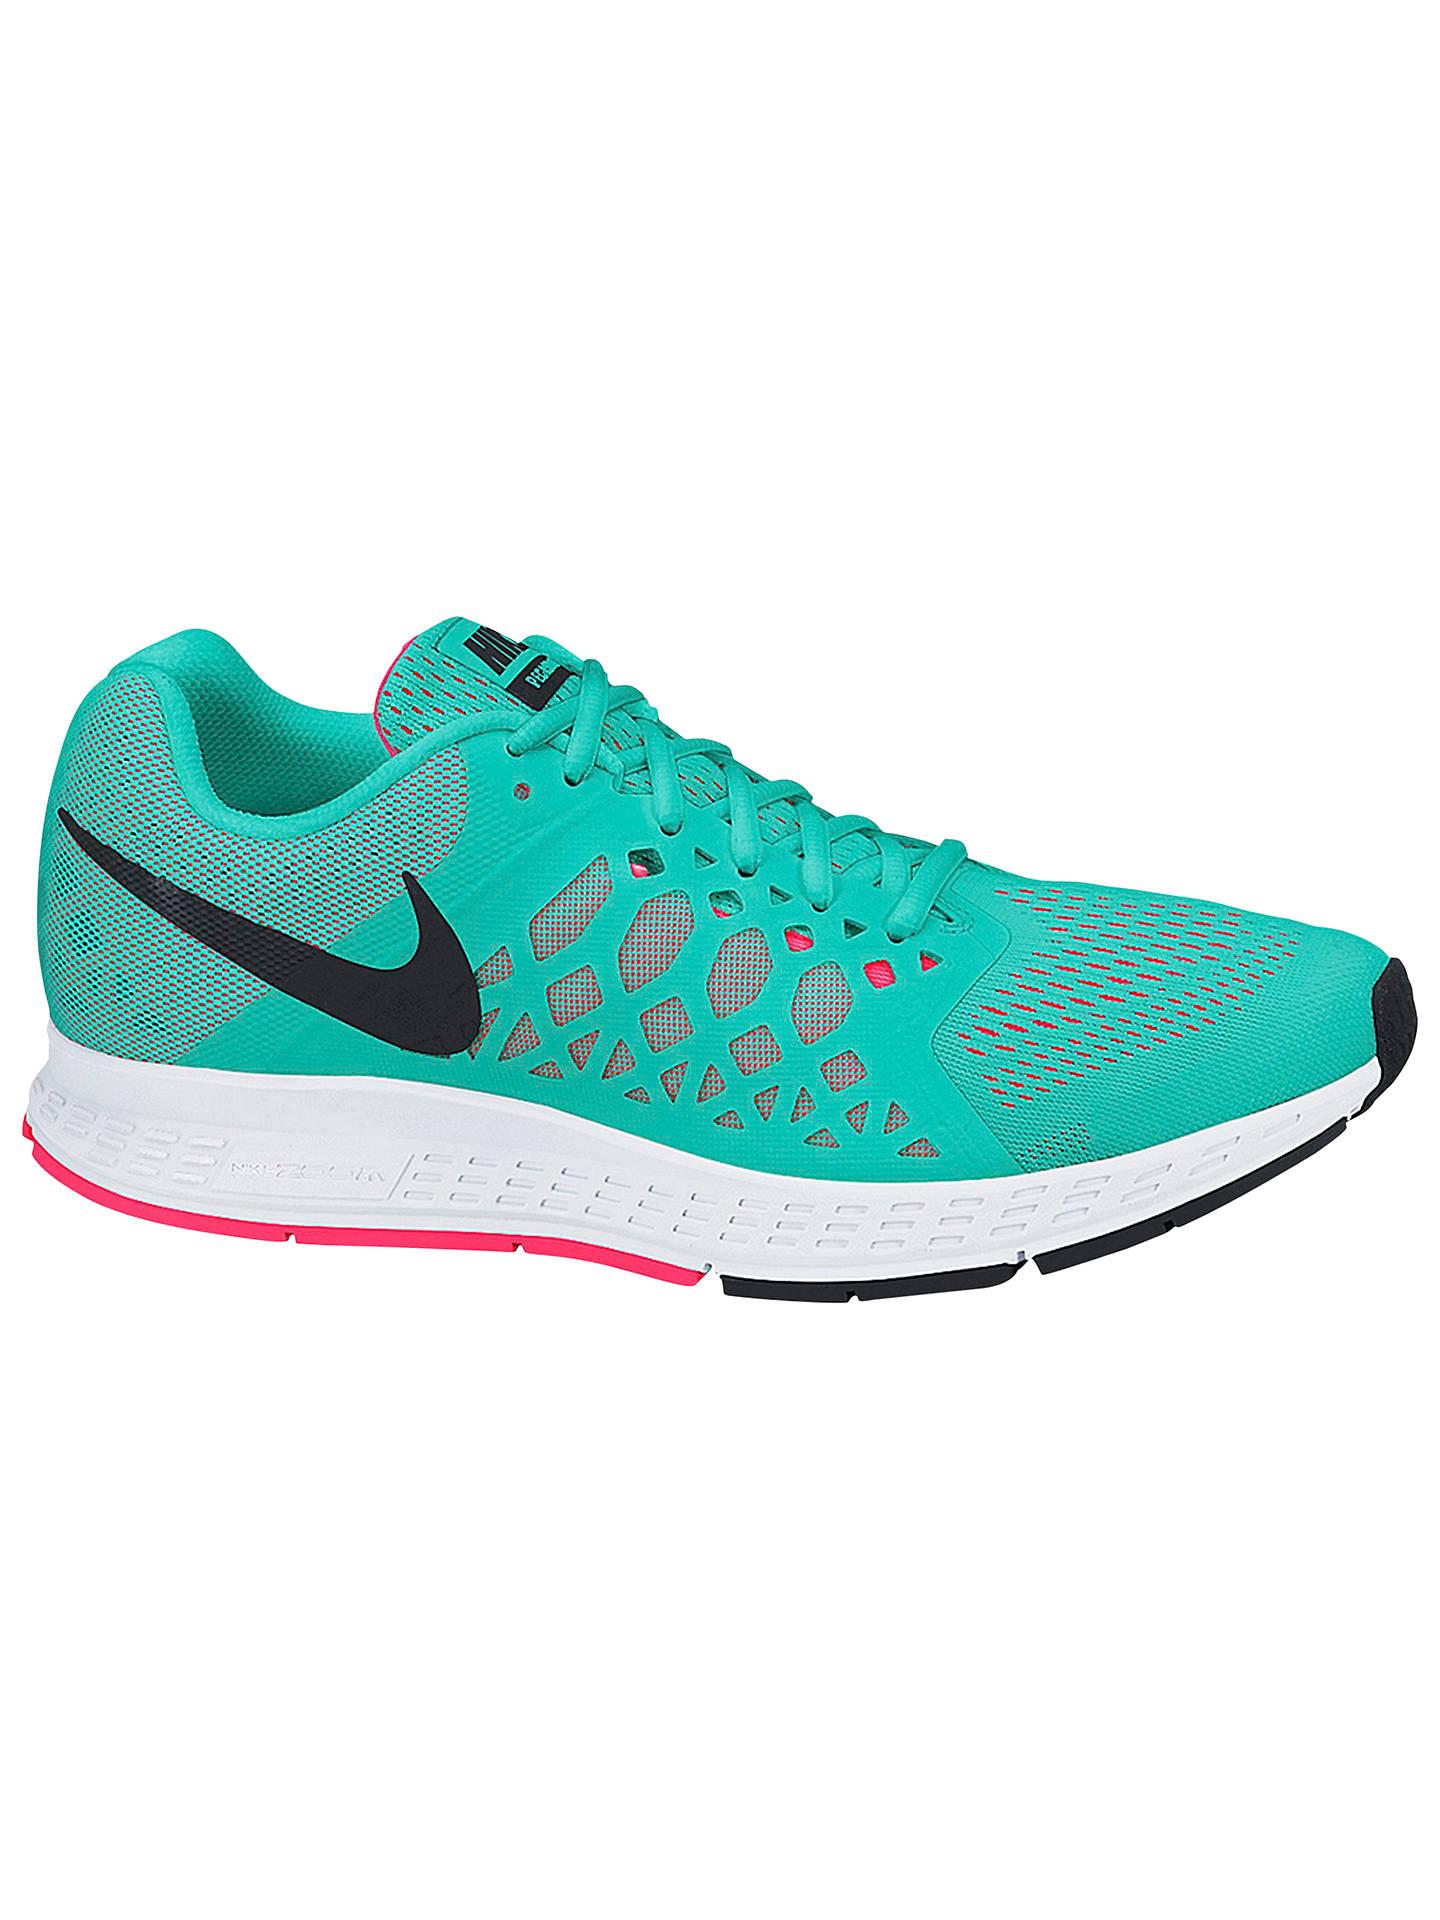 newest 61fe6 916b8 Nike Air Zoom Pegasus 31 Women's Running Shoes at John Lewis ...